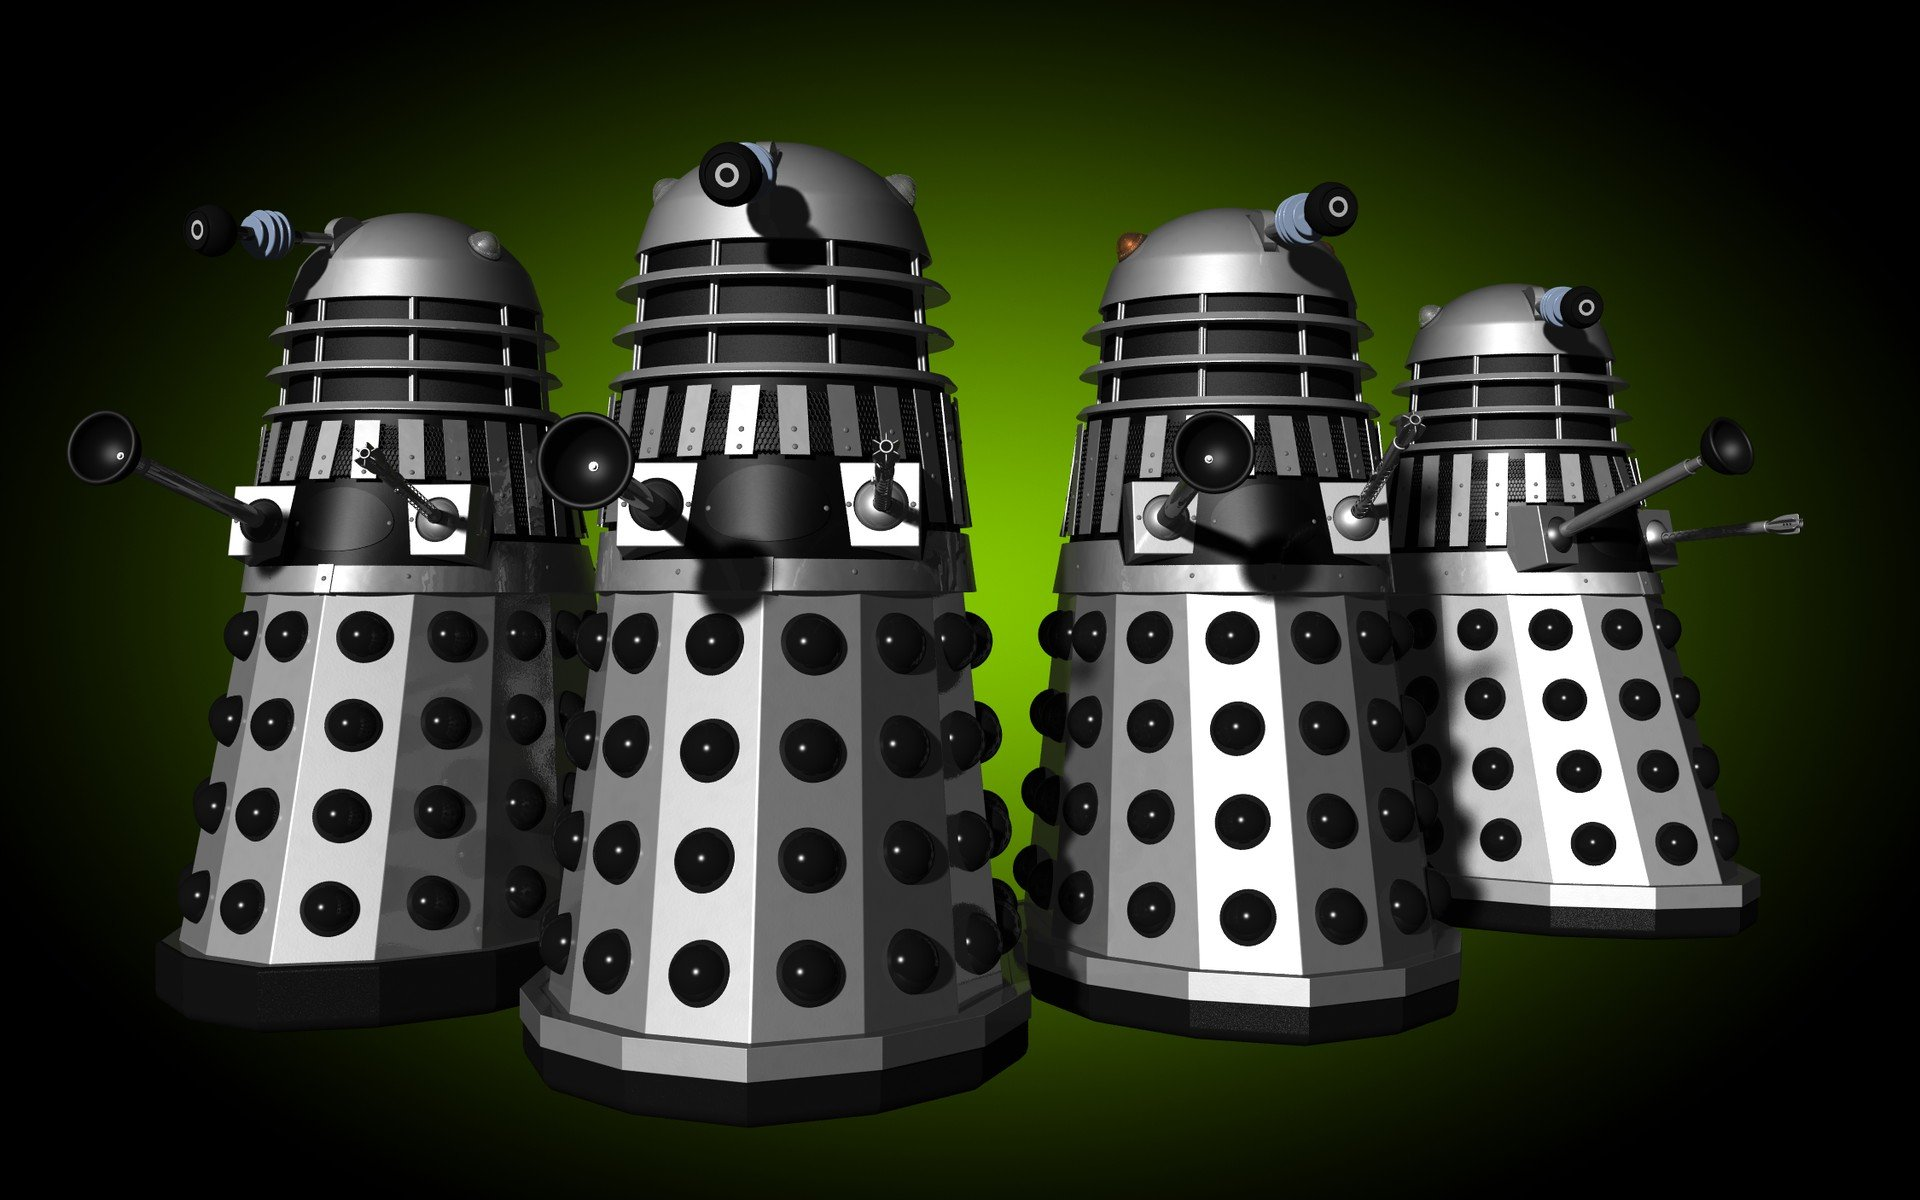 Dalek - Doctor Who Wallpaper